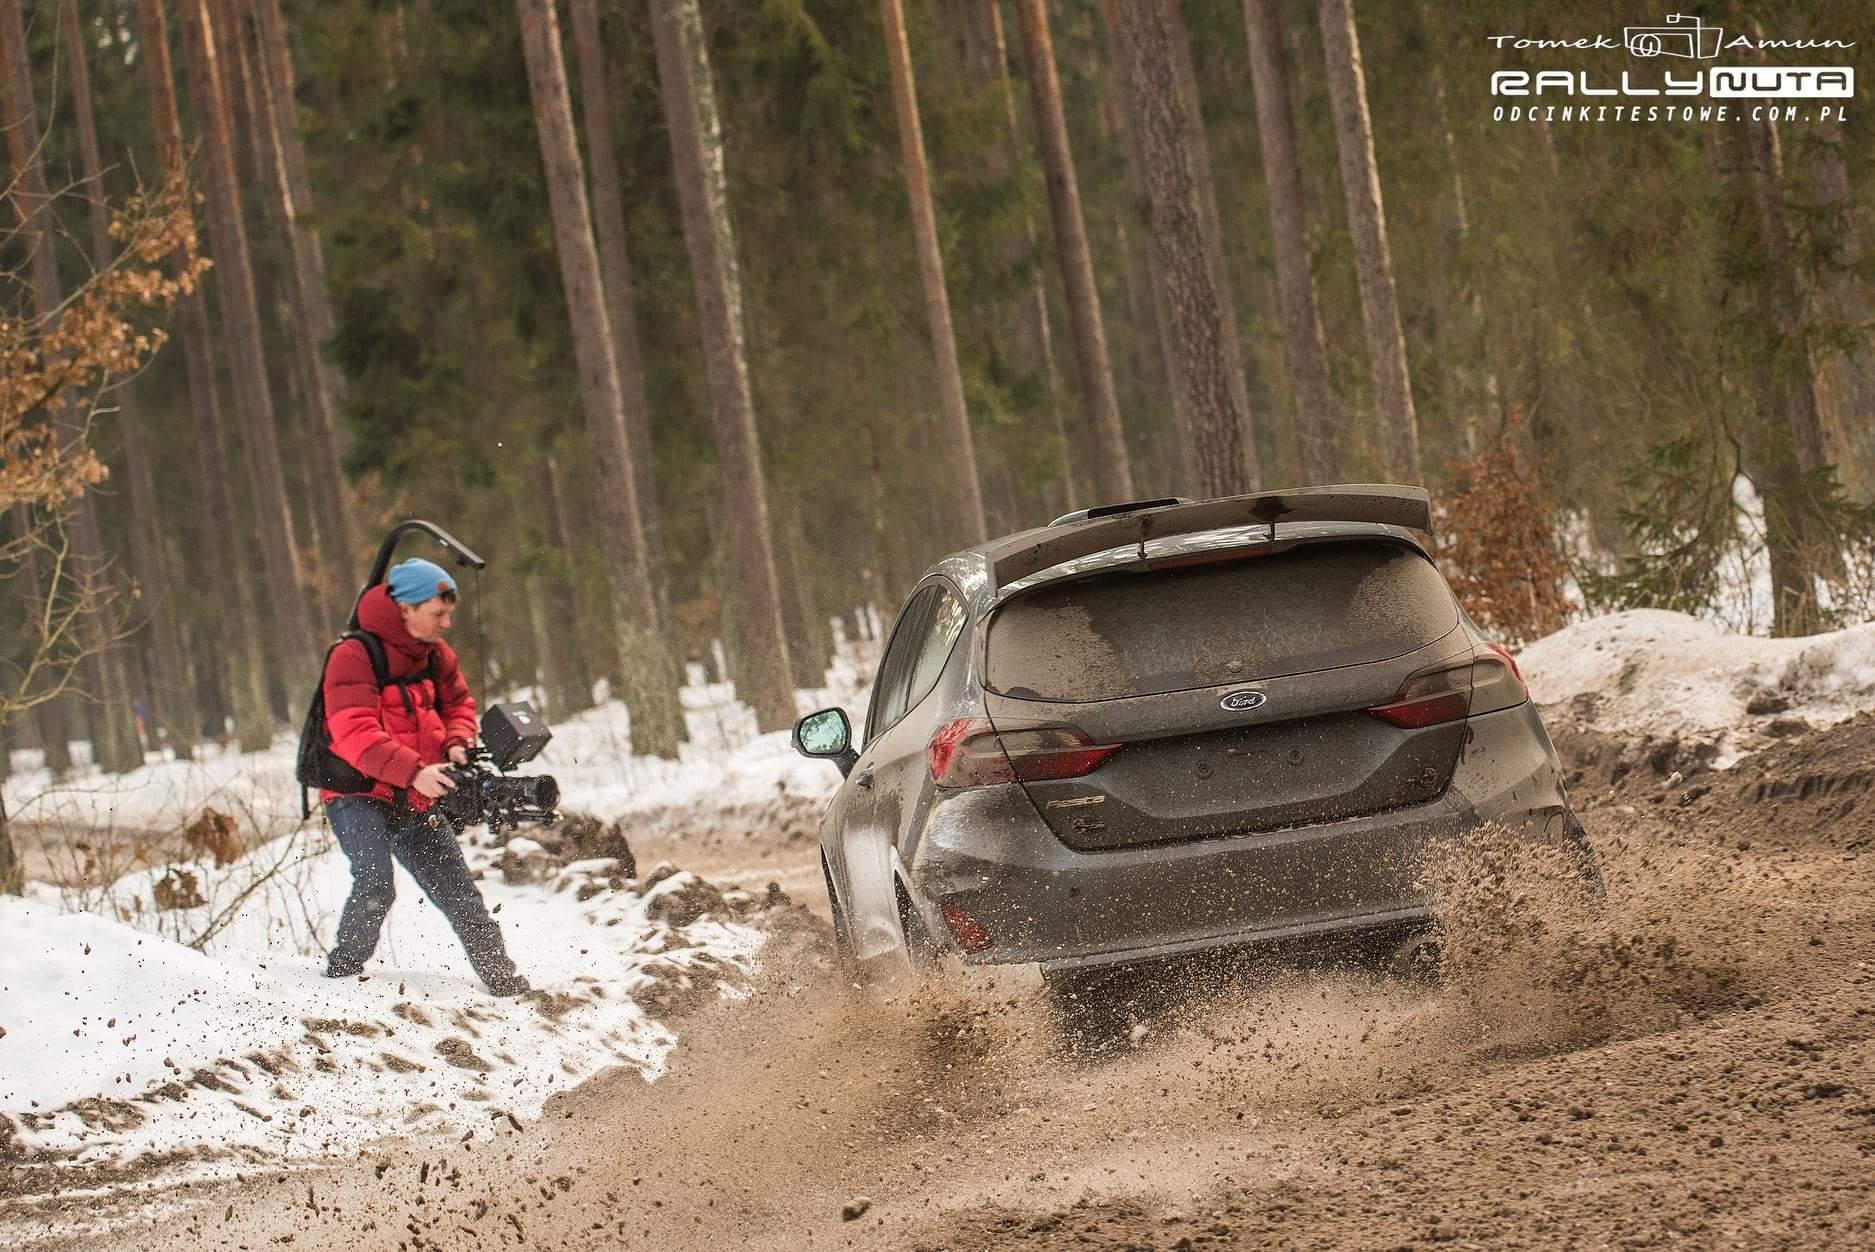 FIA European Rally Championship: Temporada 2021 - Página 3 Eu8GSUjXMAQ2pwp?format=jpg&name=large